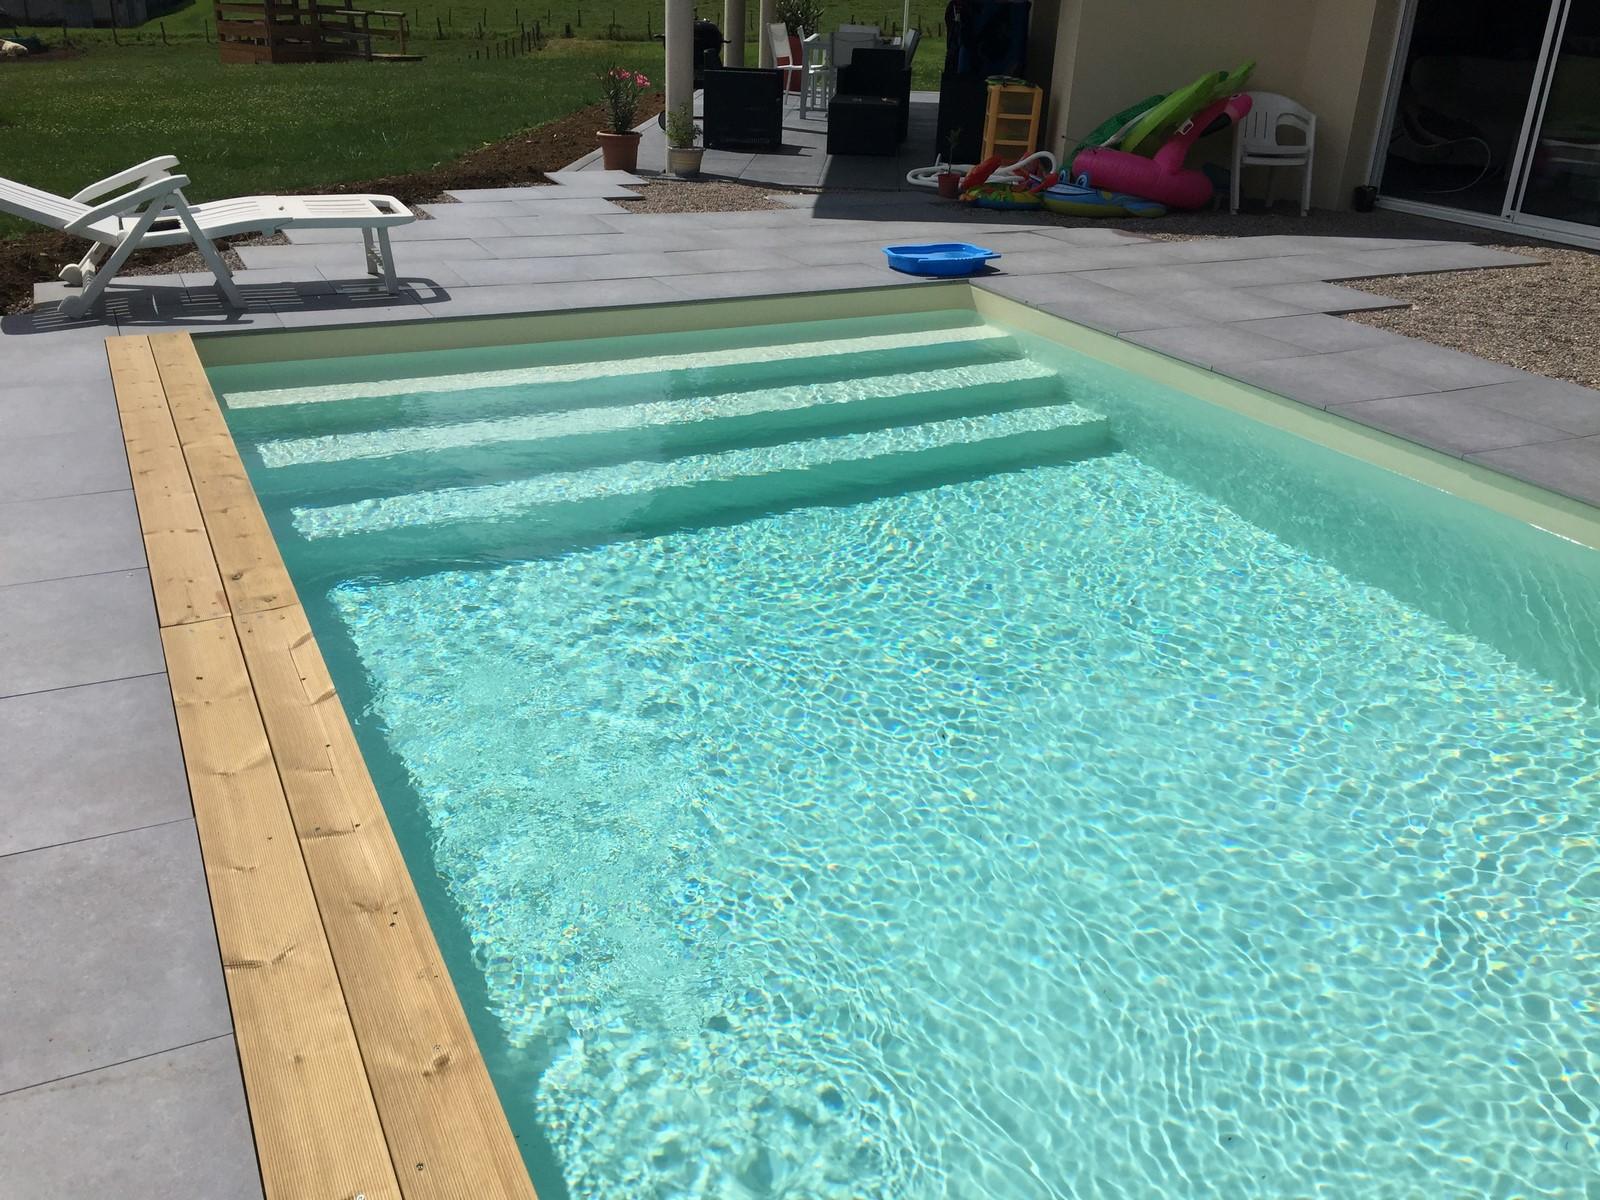 Kit piscine bois hors sol rectangulaire luxe 620x420 x 130 for Piscine hors sol rectangulaire